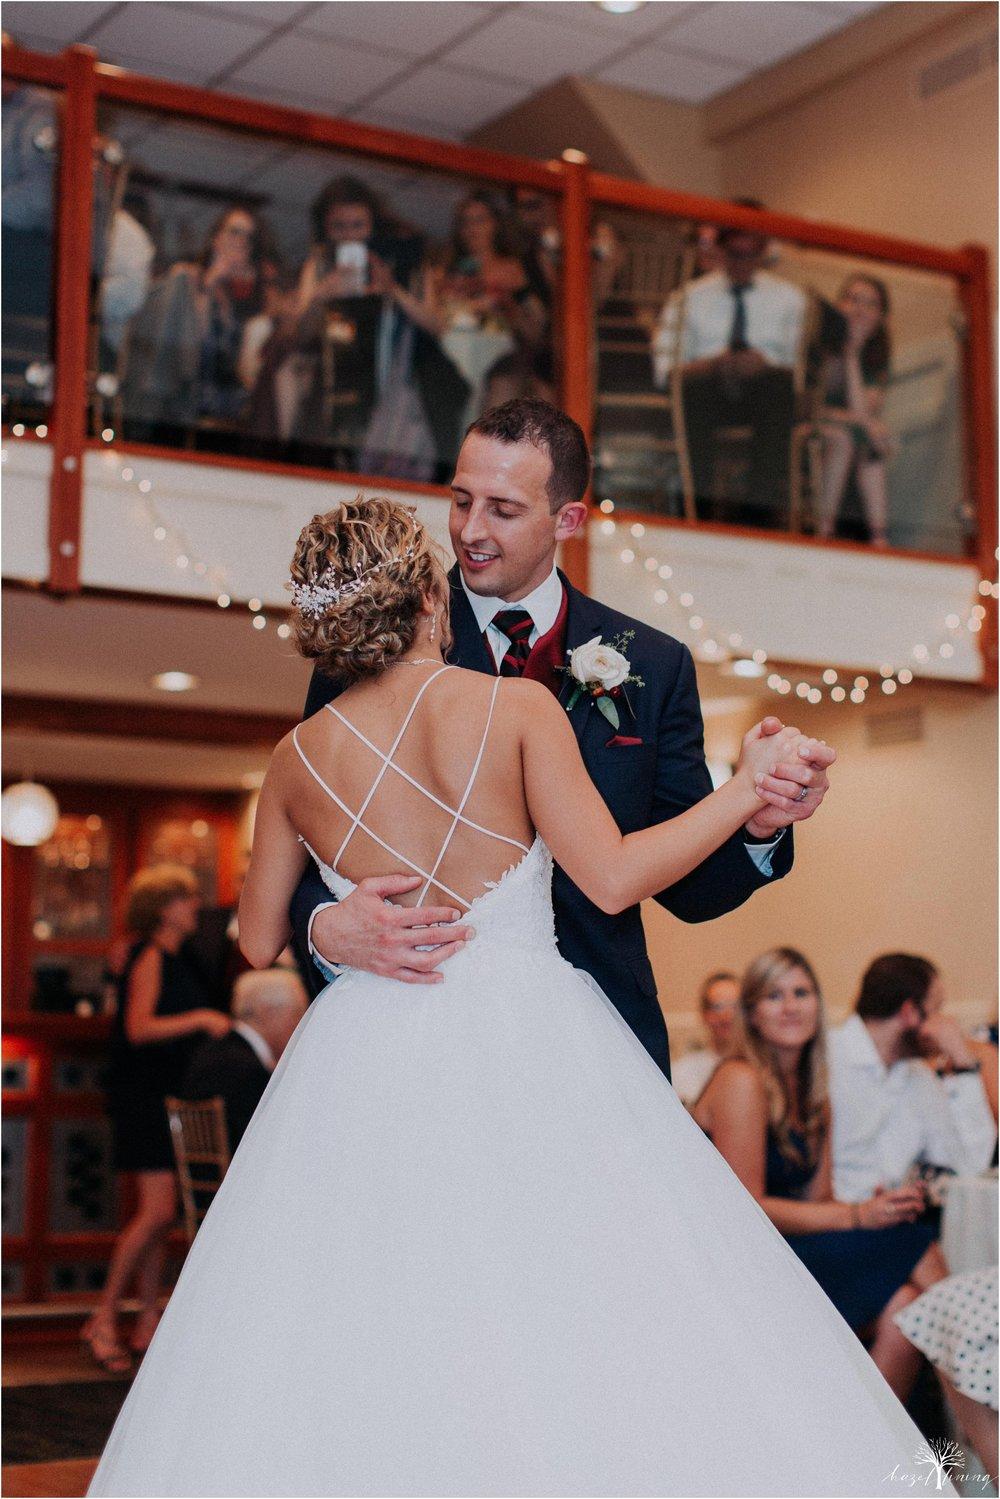 jonathan-weibel-becky-haywood-loft-at-sweetwater-cc-pennsburg-pennsylvania-rainy-day-summer-wedding-hazel-lining-travel-wedding-elopement-photography_0109.jpg